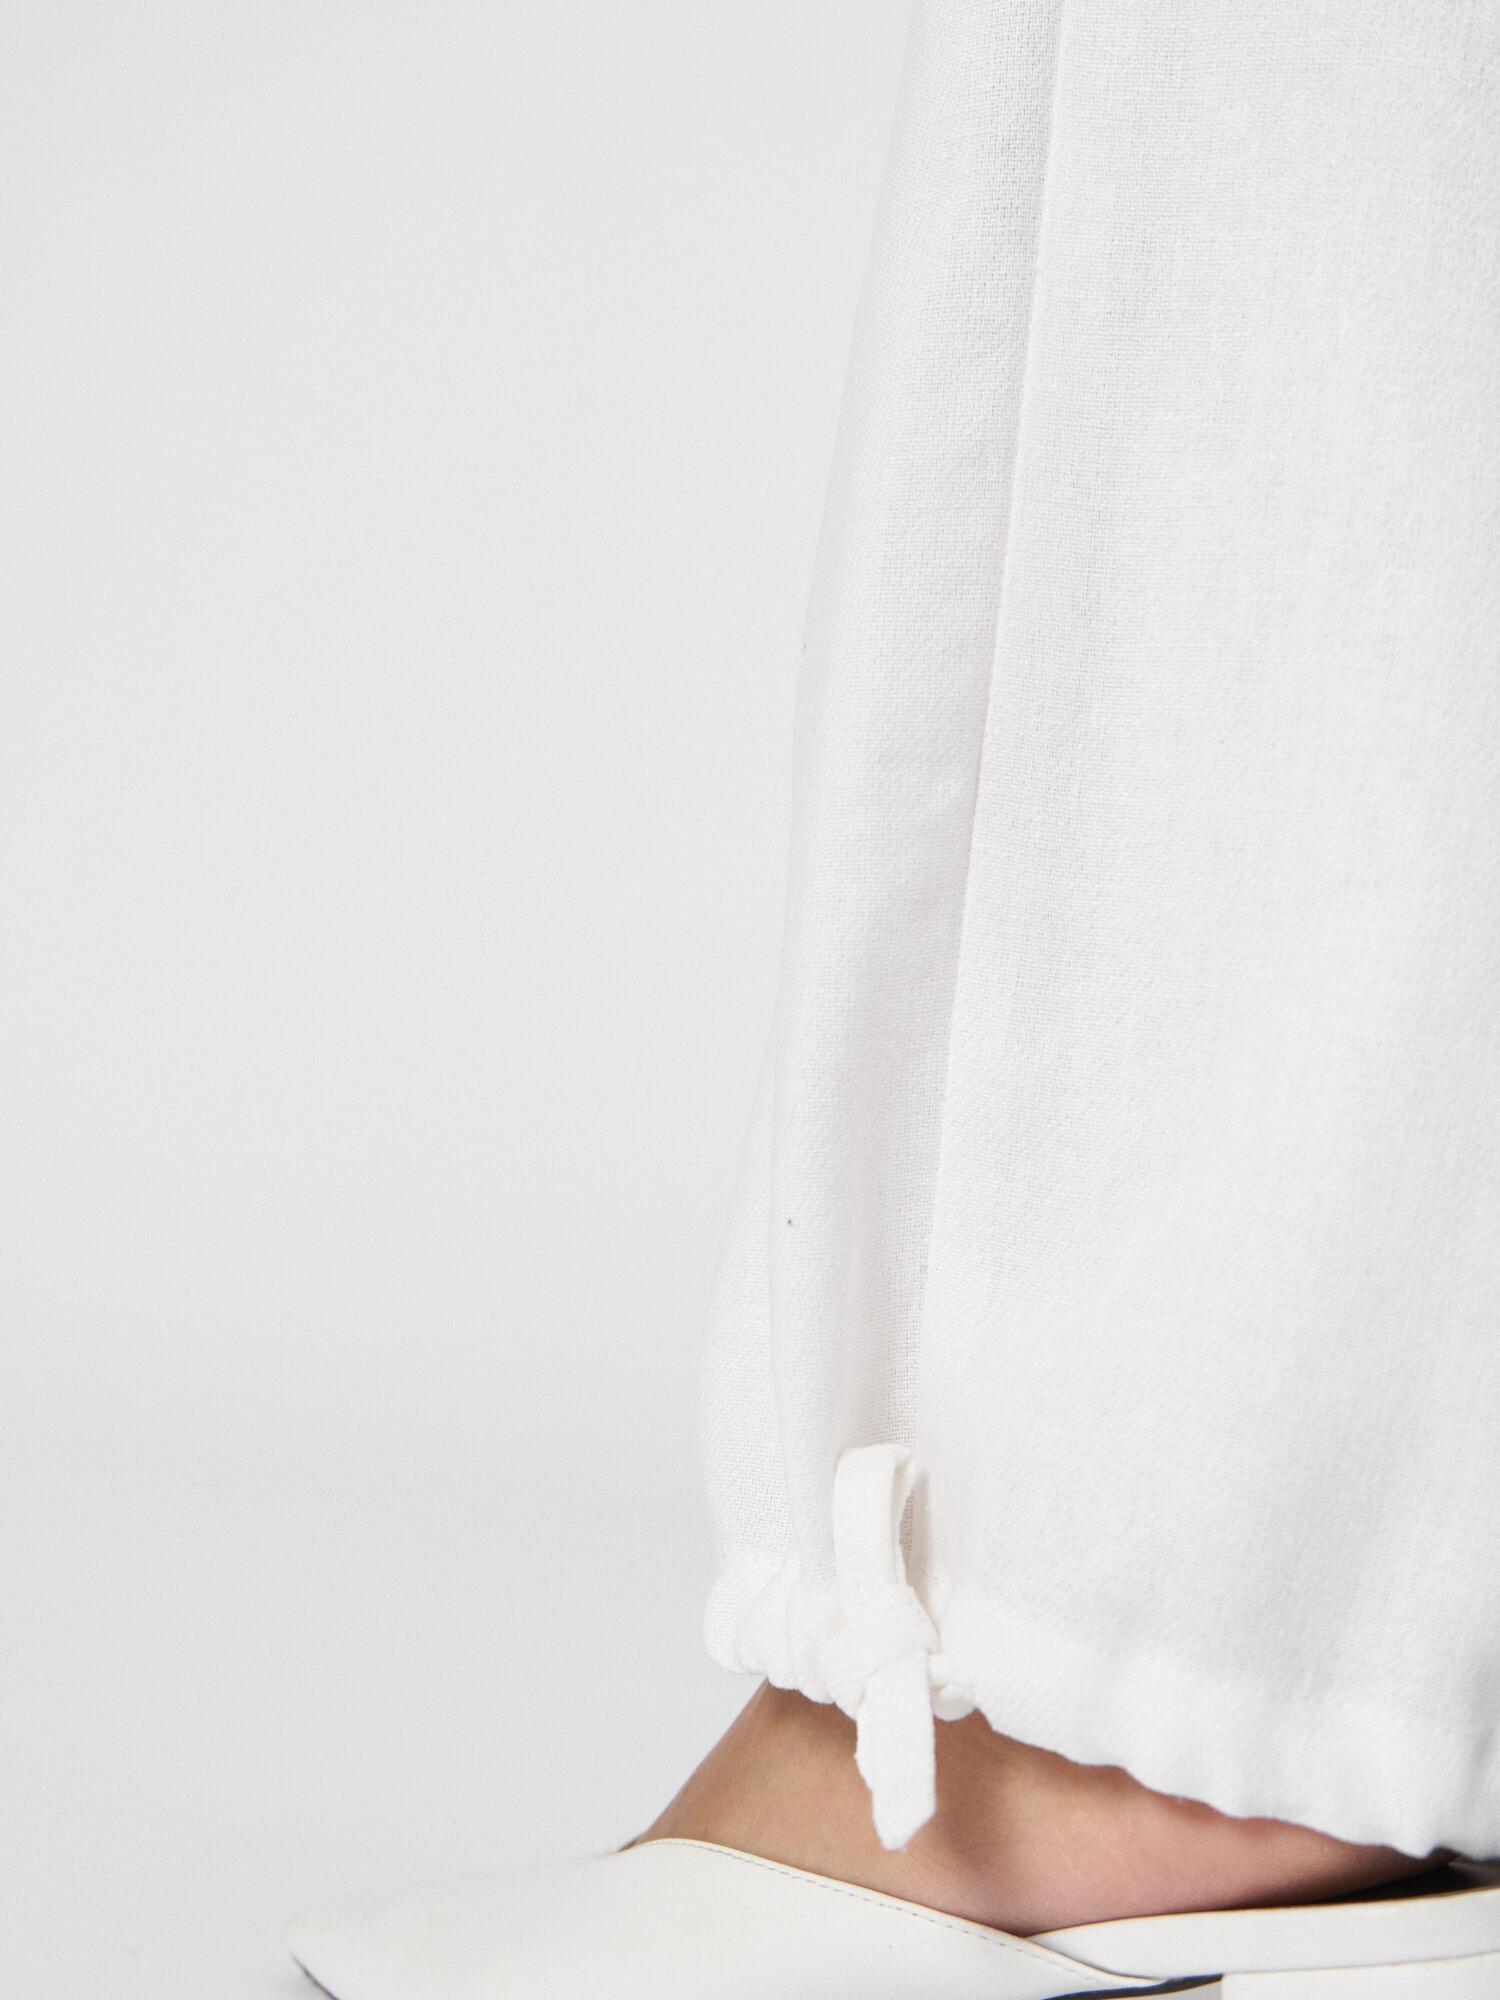 Брюки-кимоно Akane в пижамном стиле, Белый